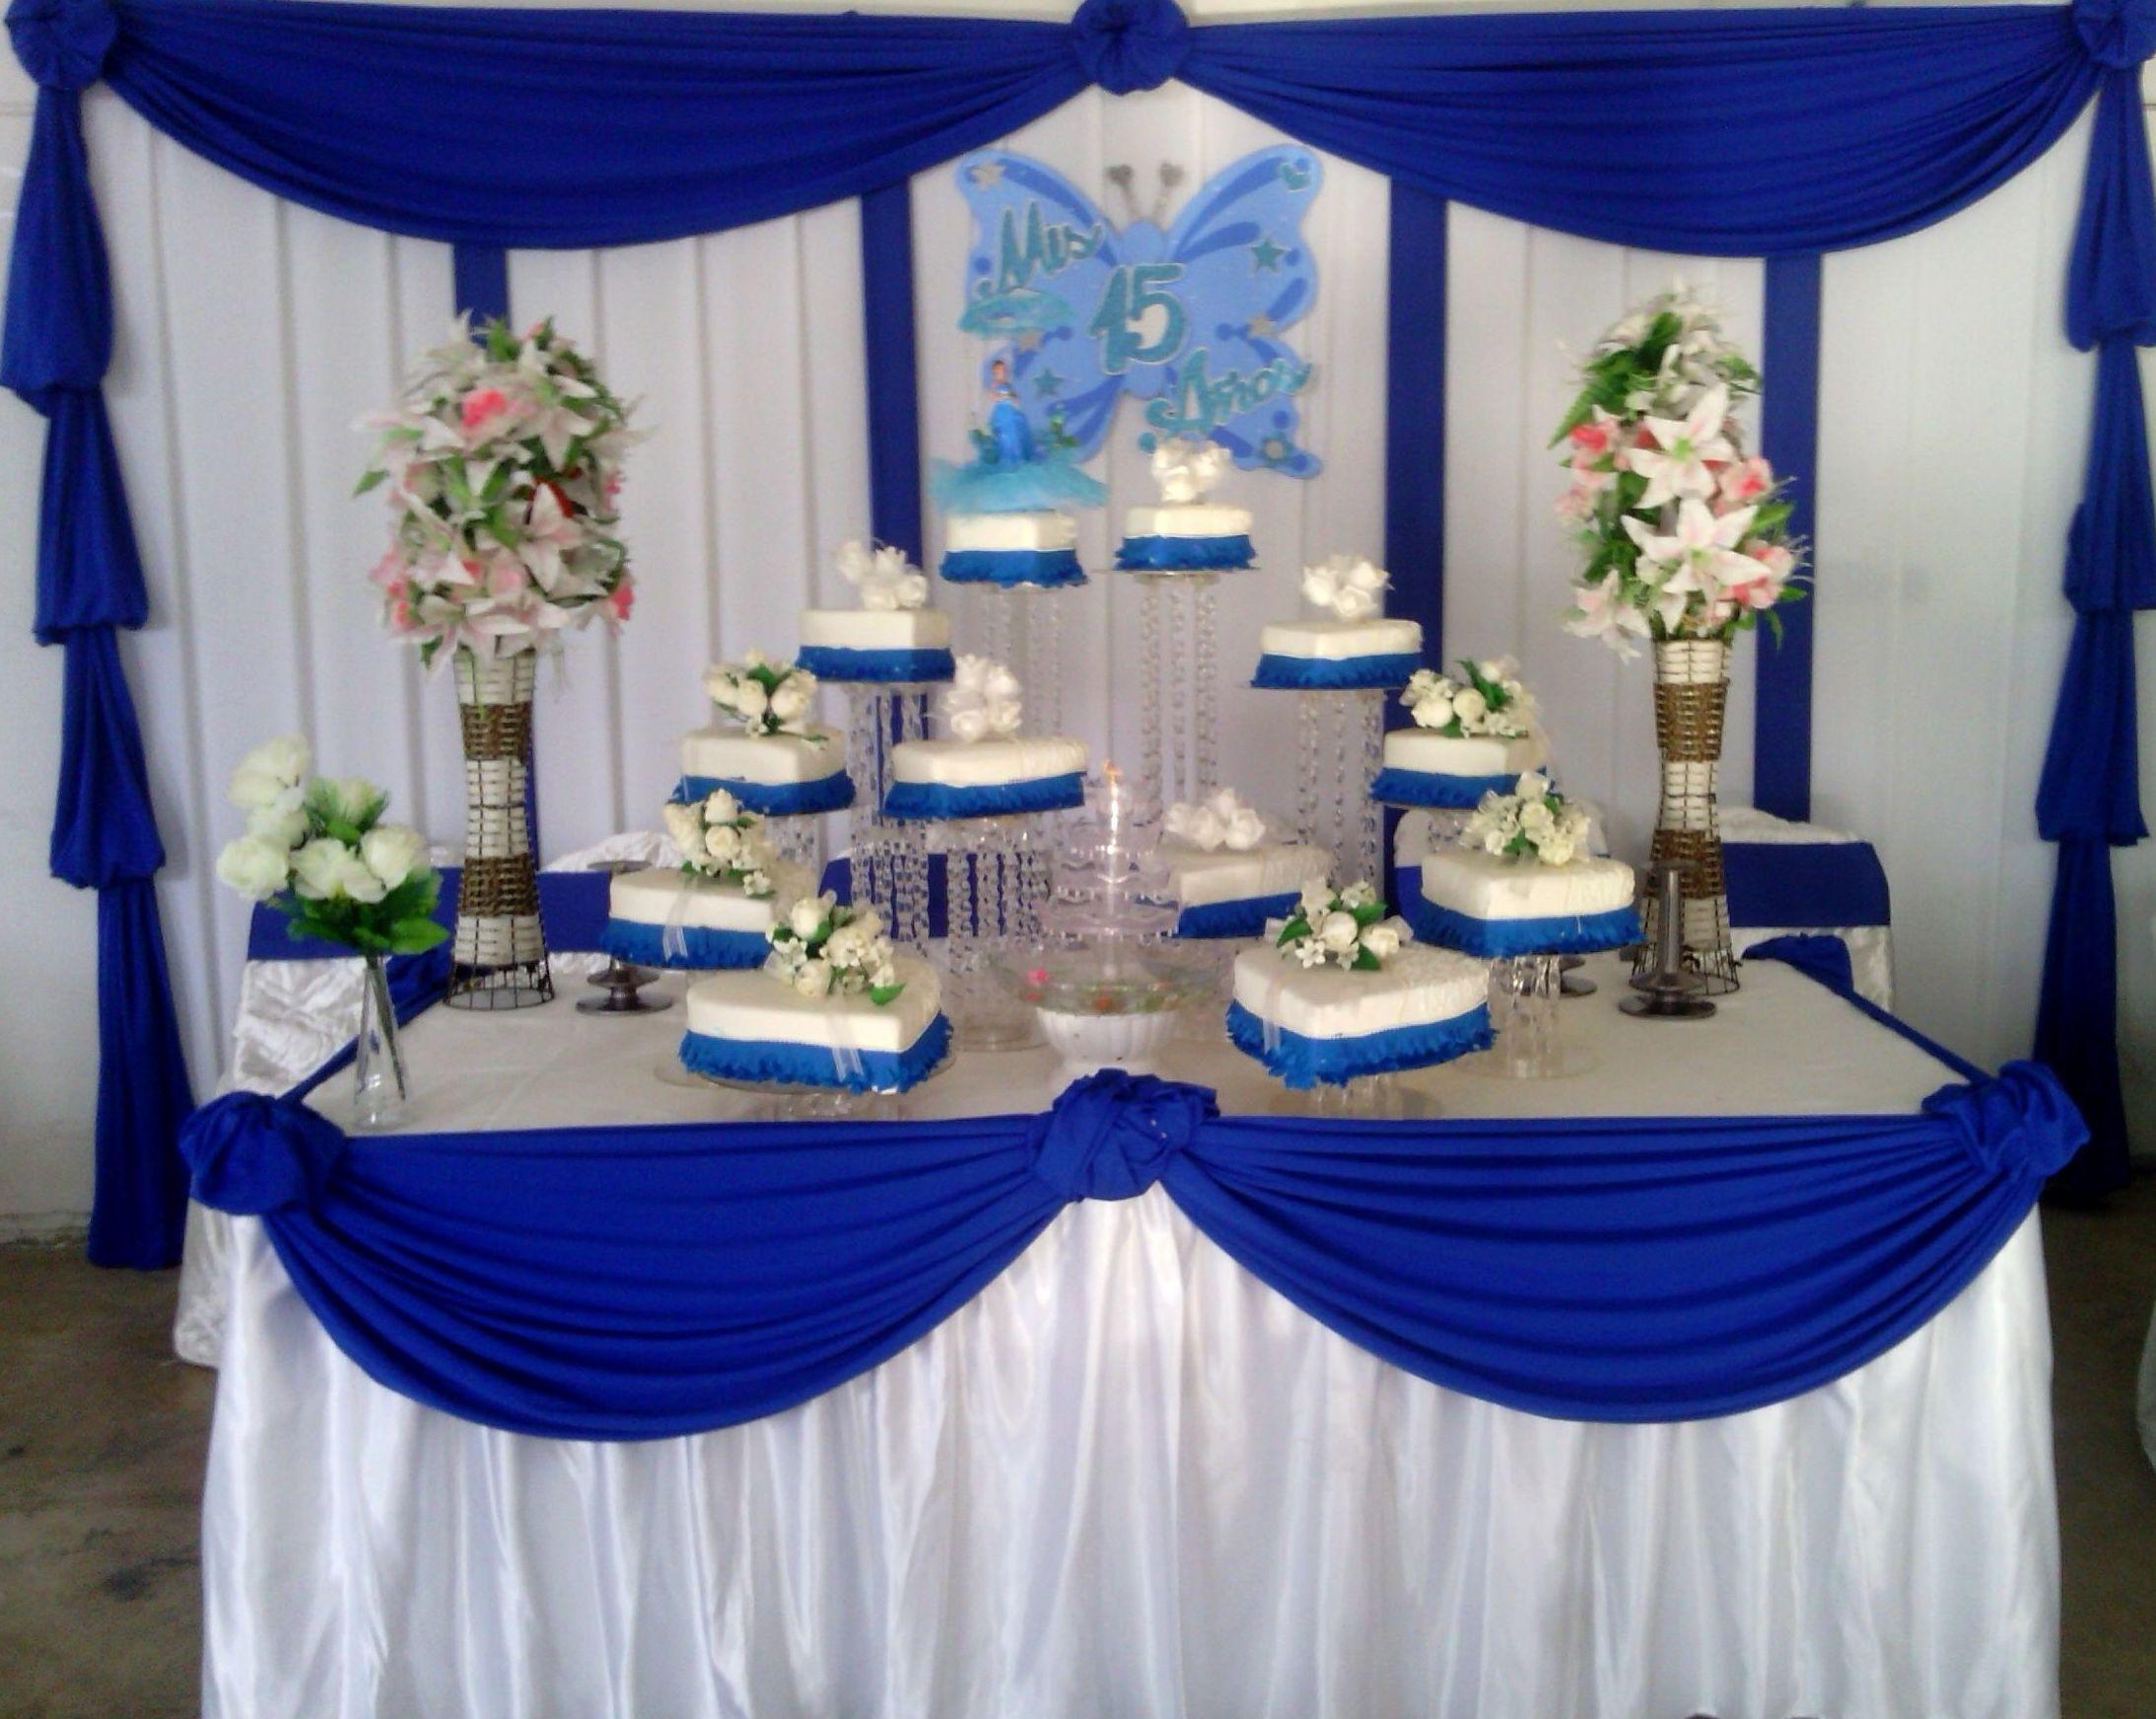 Decoraciones con telas globos para bodas quince aos auto for Decoracion de quinceanera